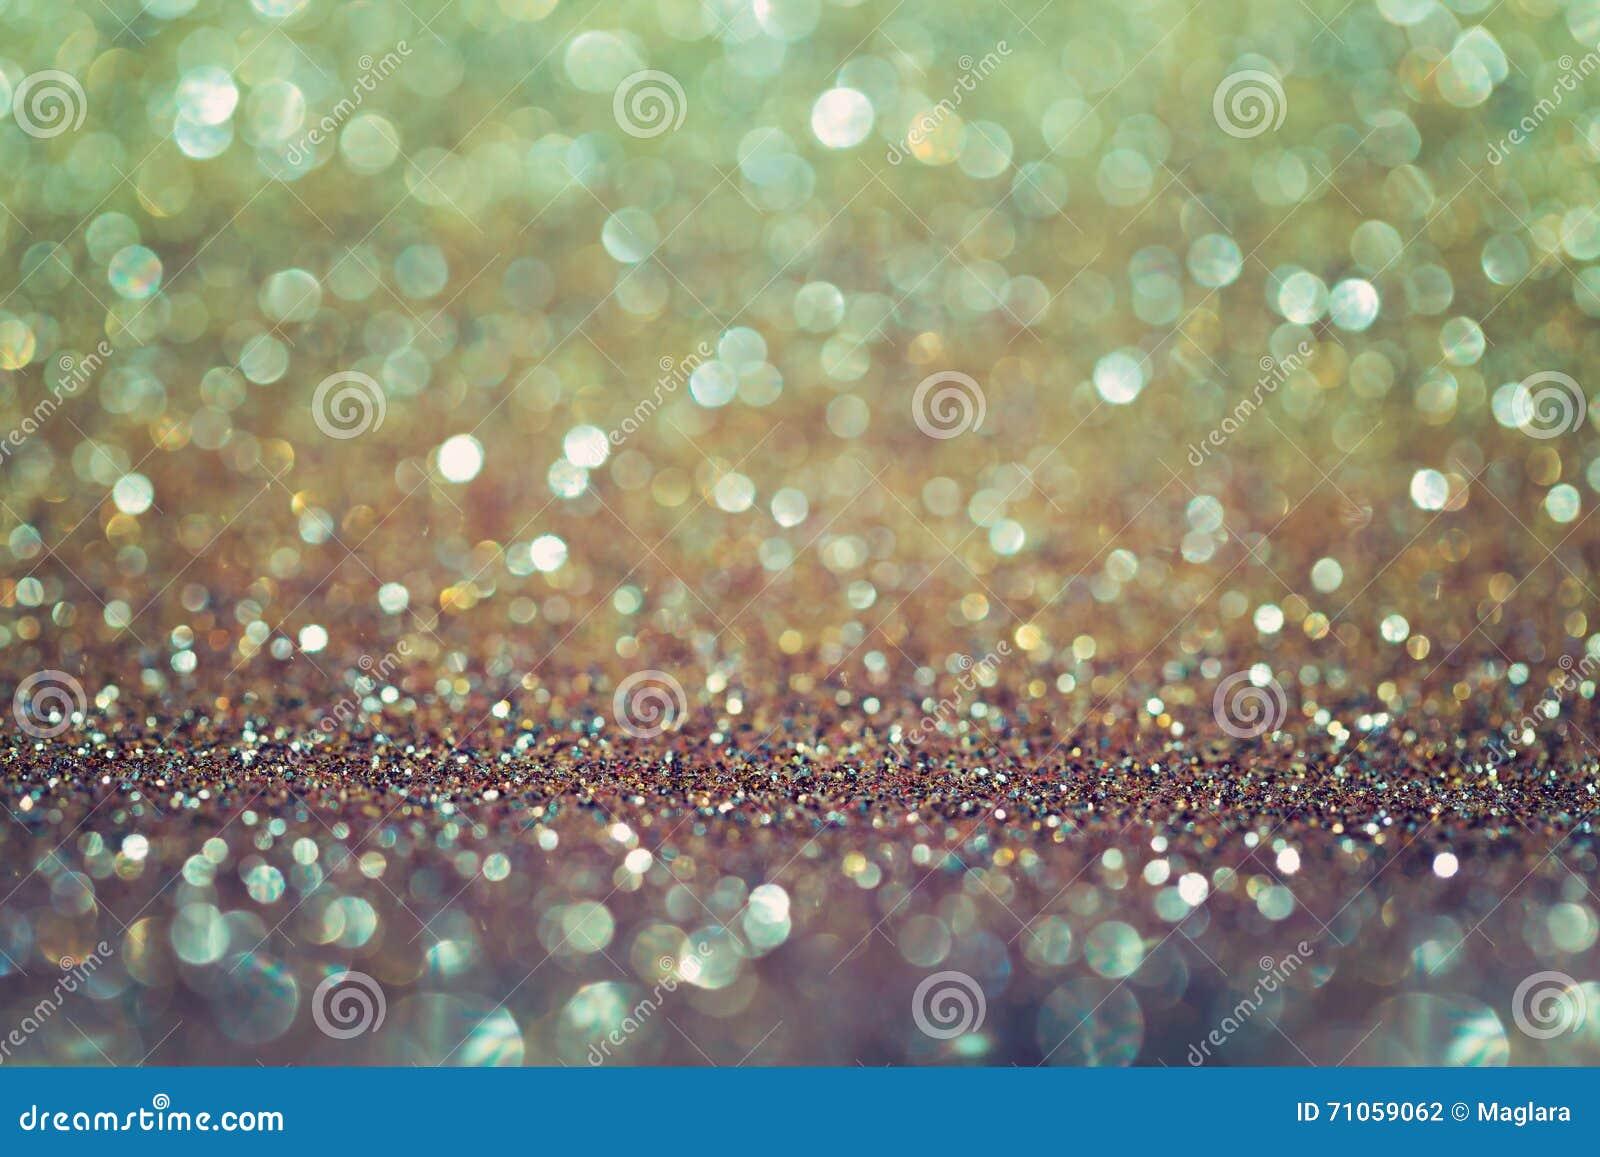 Golden glitter bokeh background elegant and glamour background stock photo image of golden - Glamour background ...